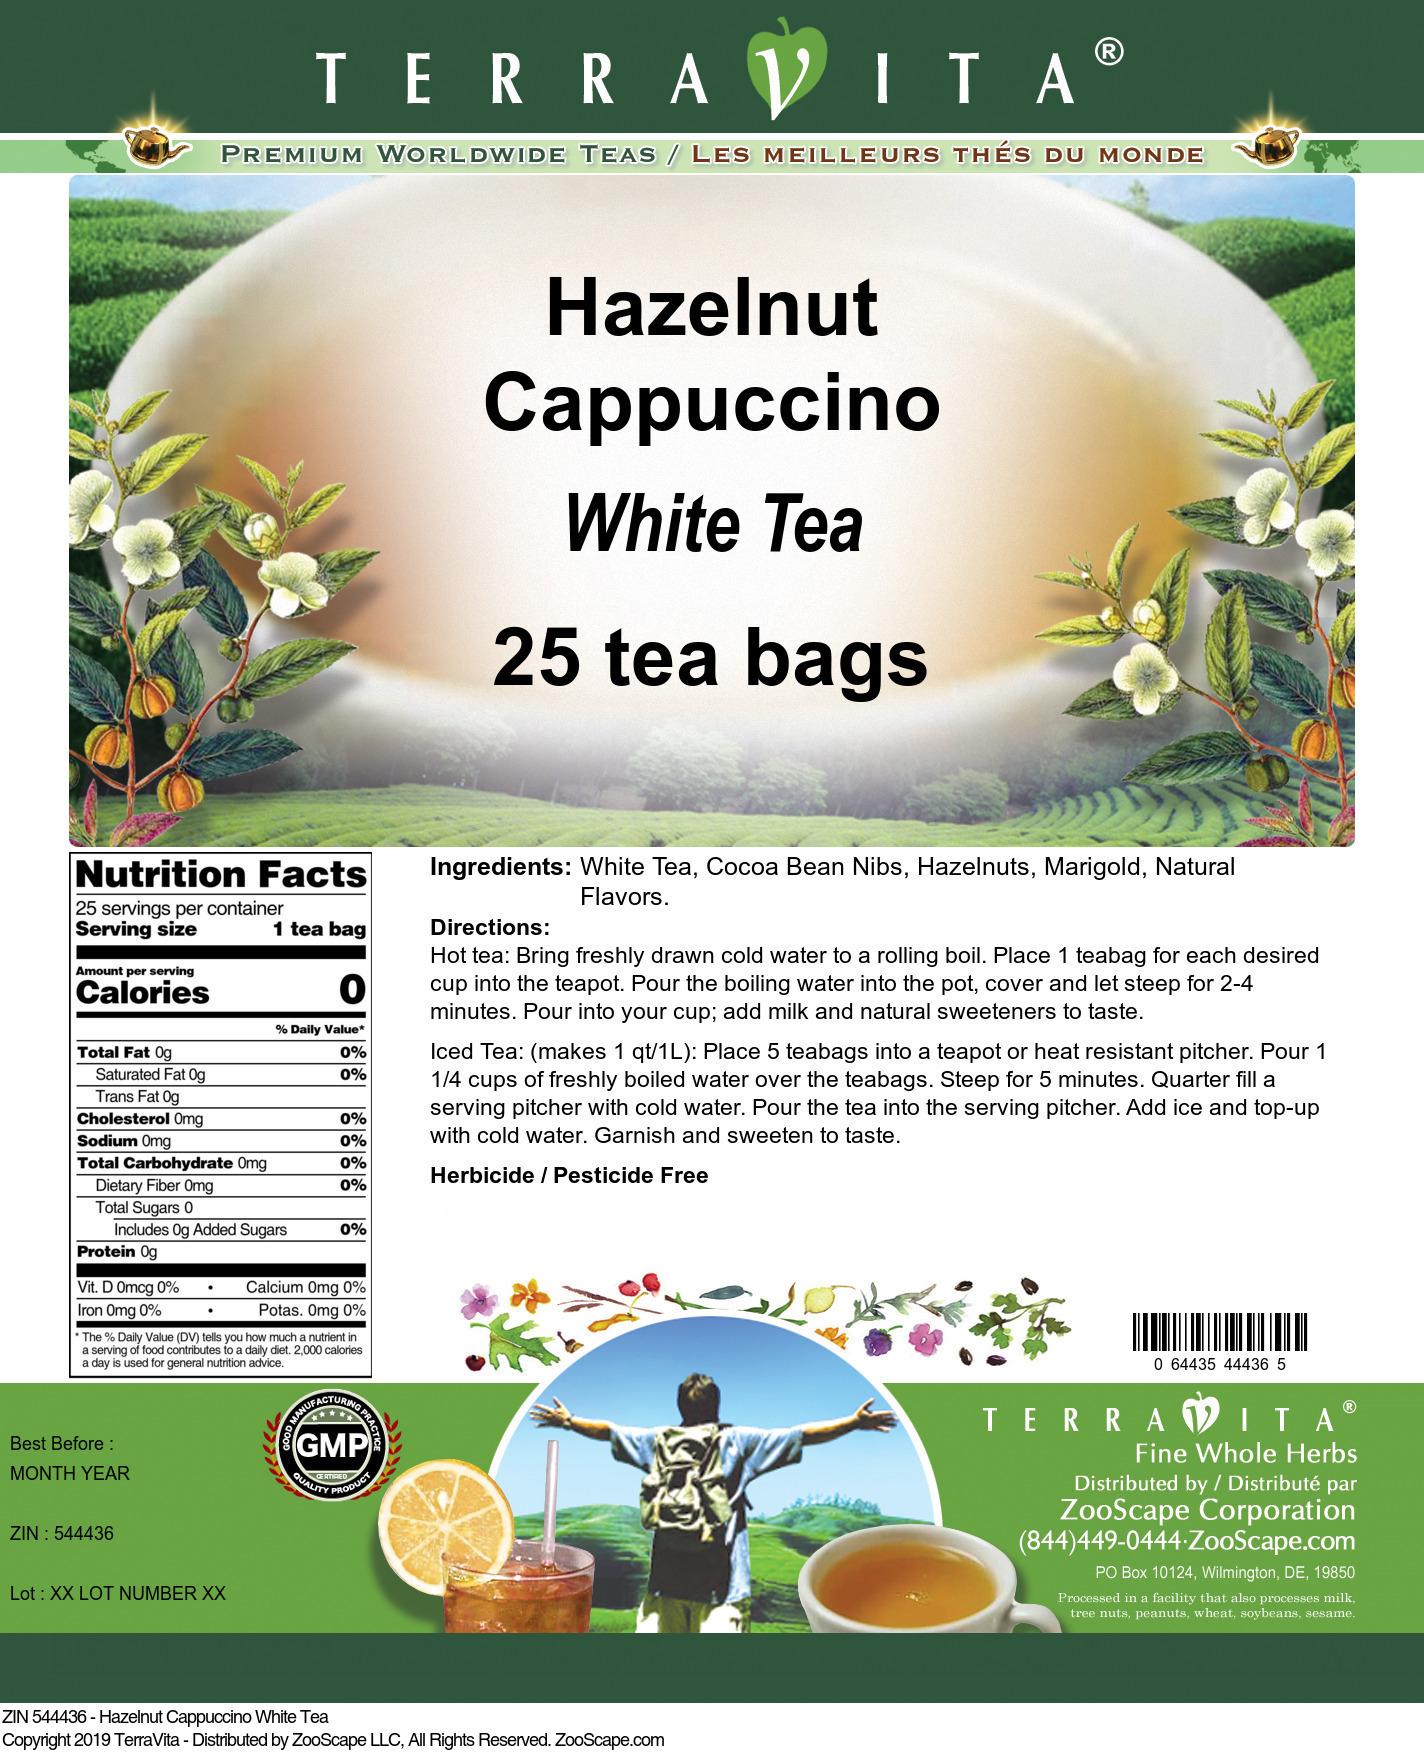 Hazelnut Cappuccino White Tea